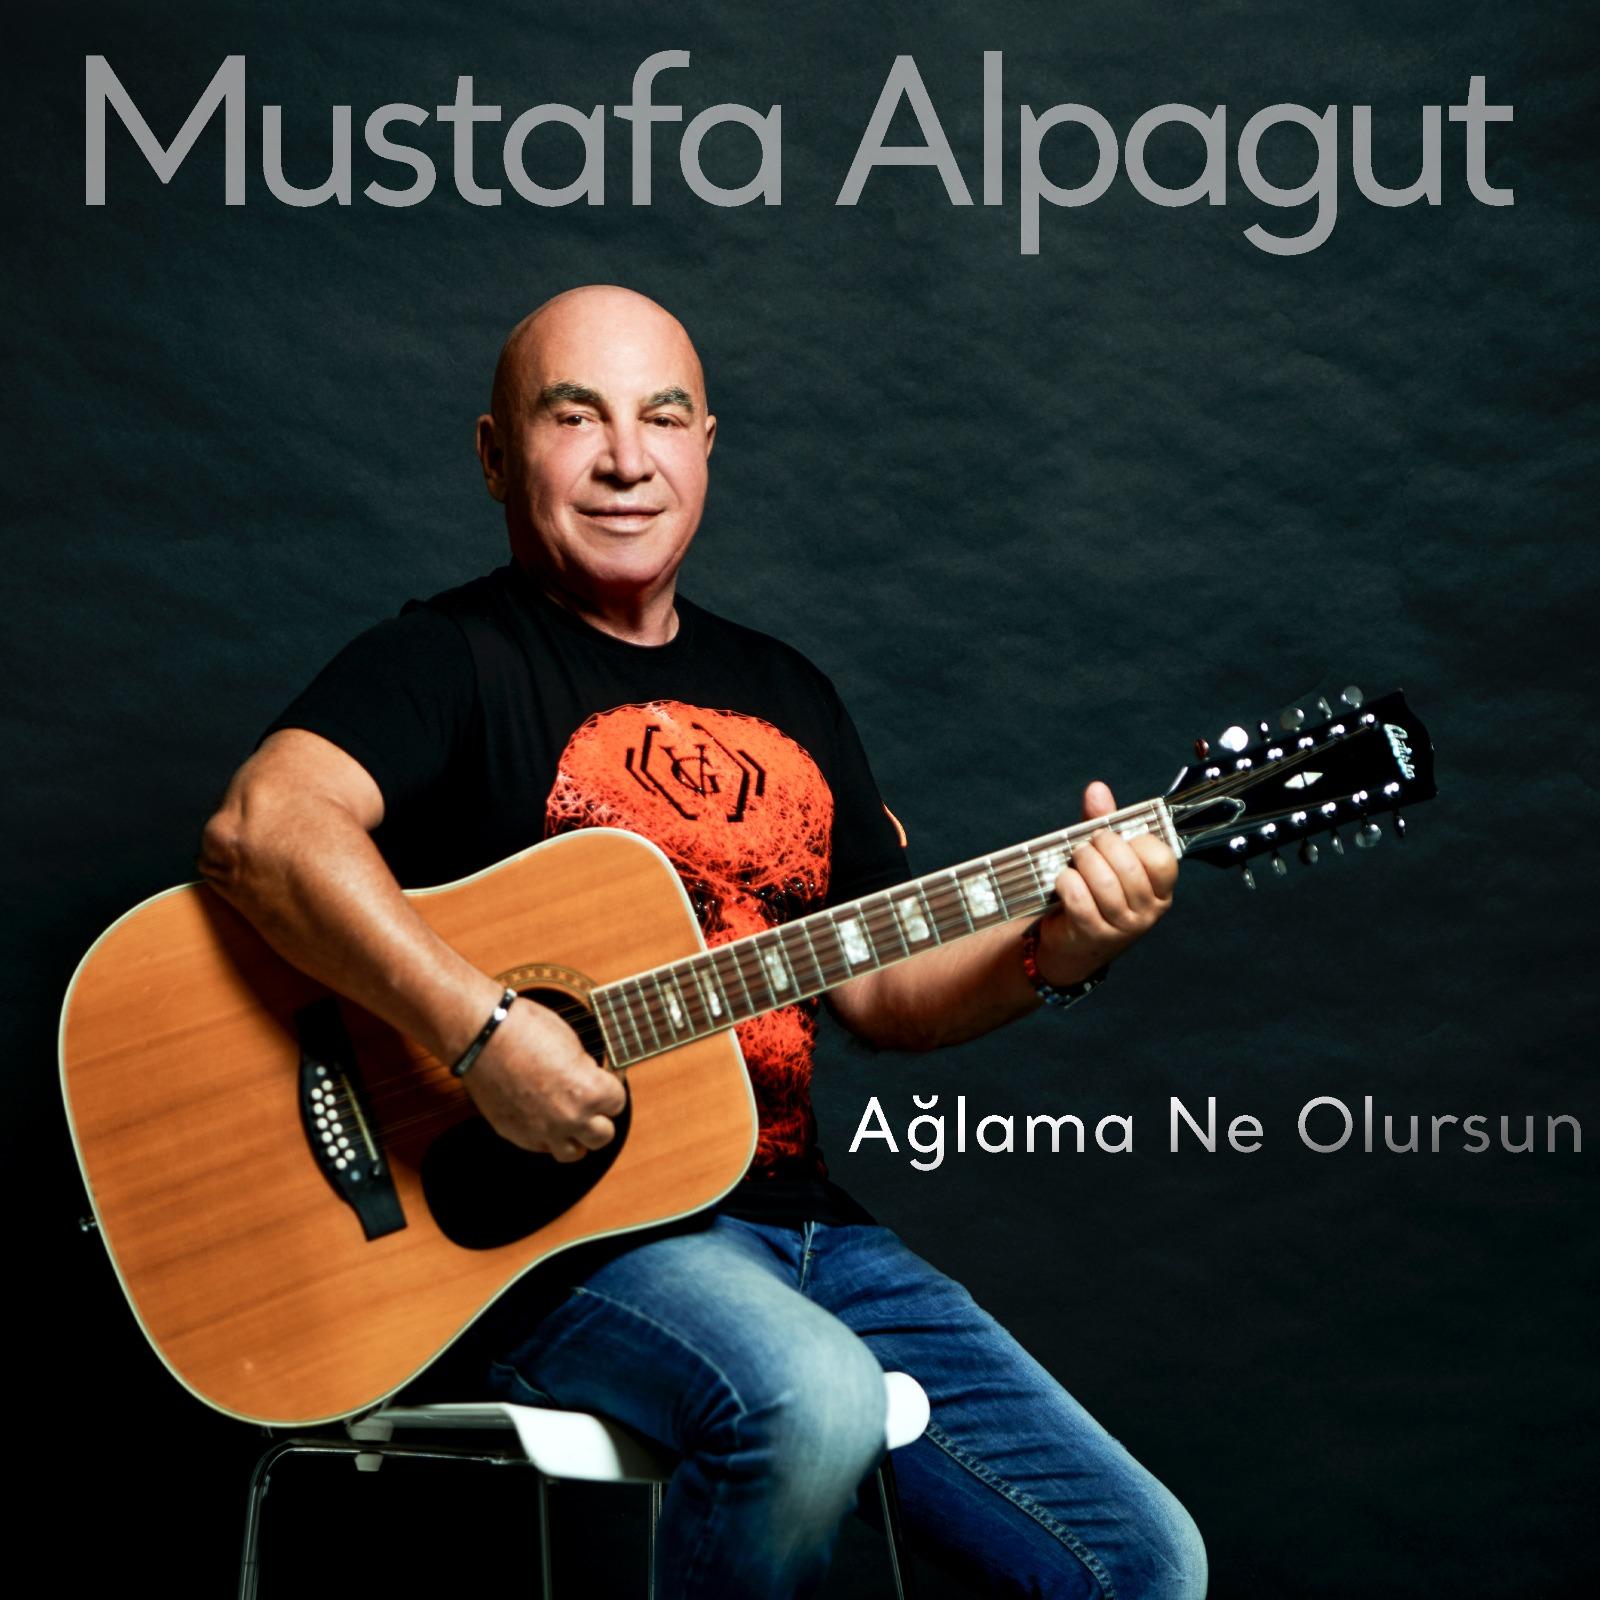 Ağlama Ne Olursun - Mustafa Alpagut